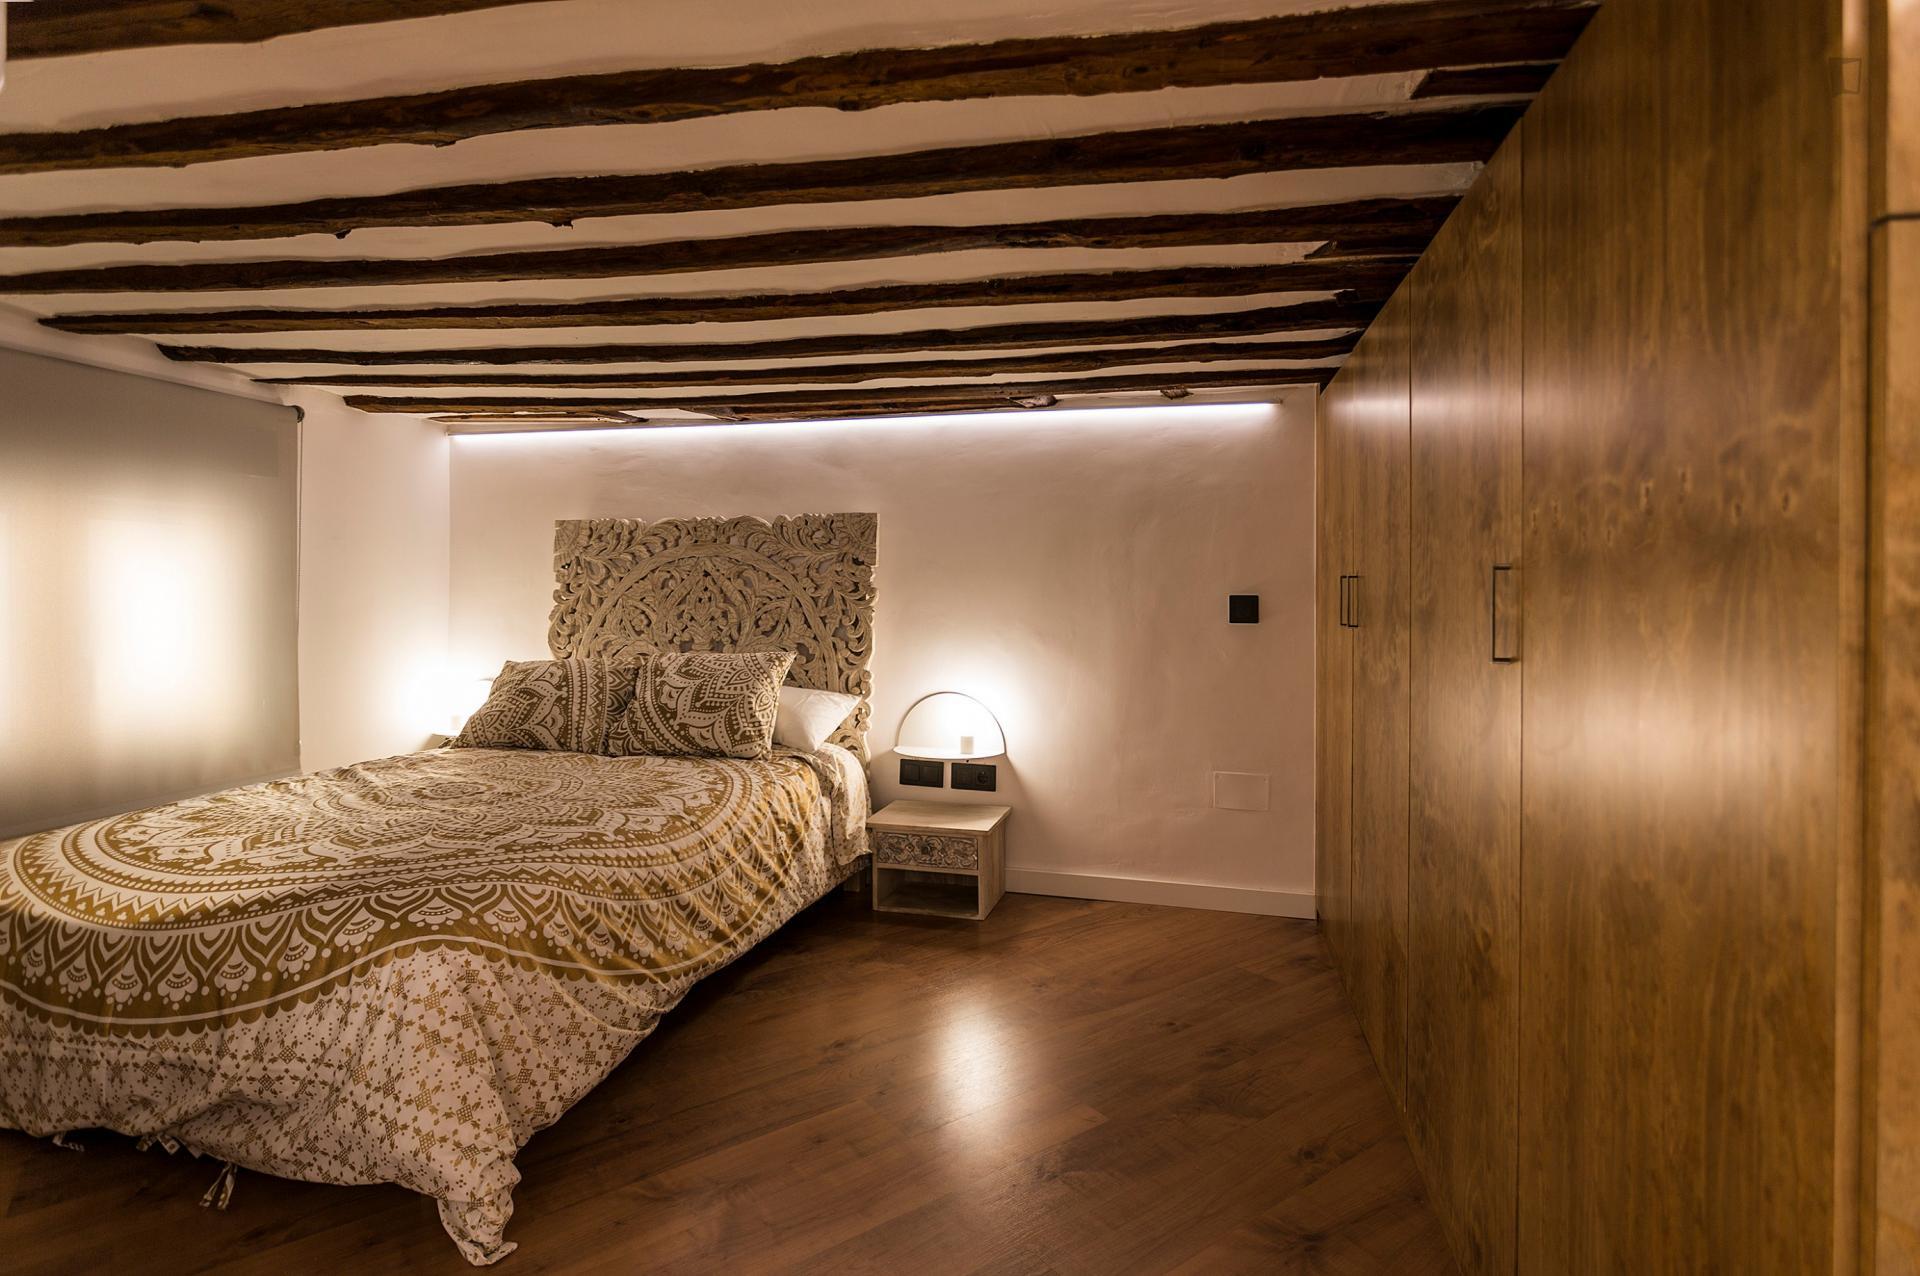 Torrecilla - One bedroom flat in Madrid